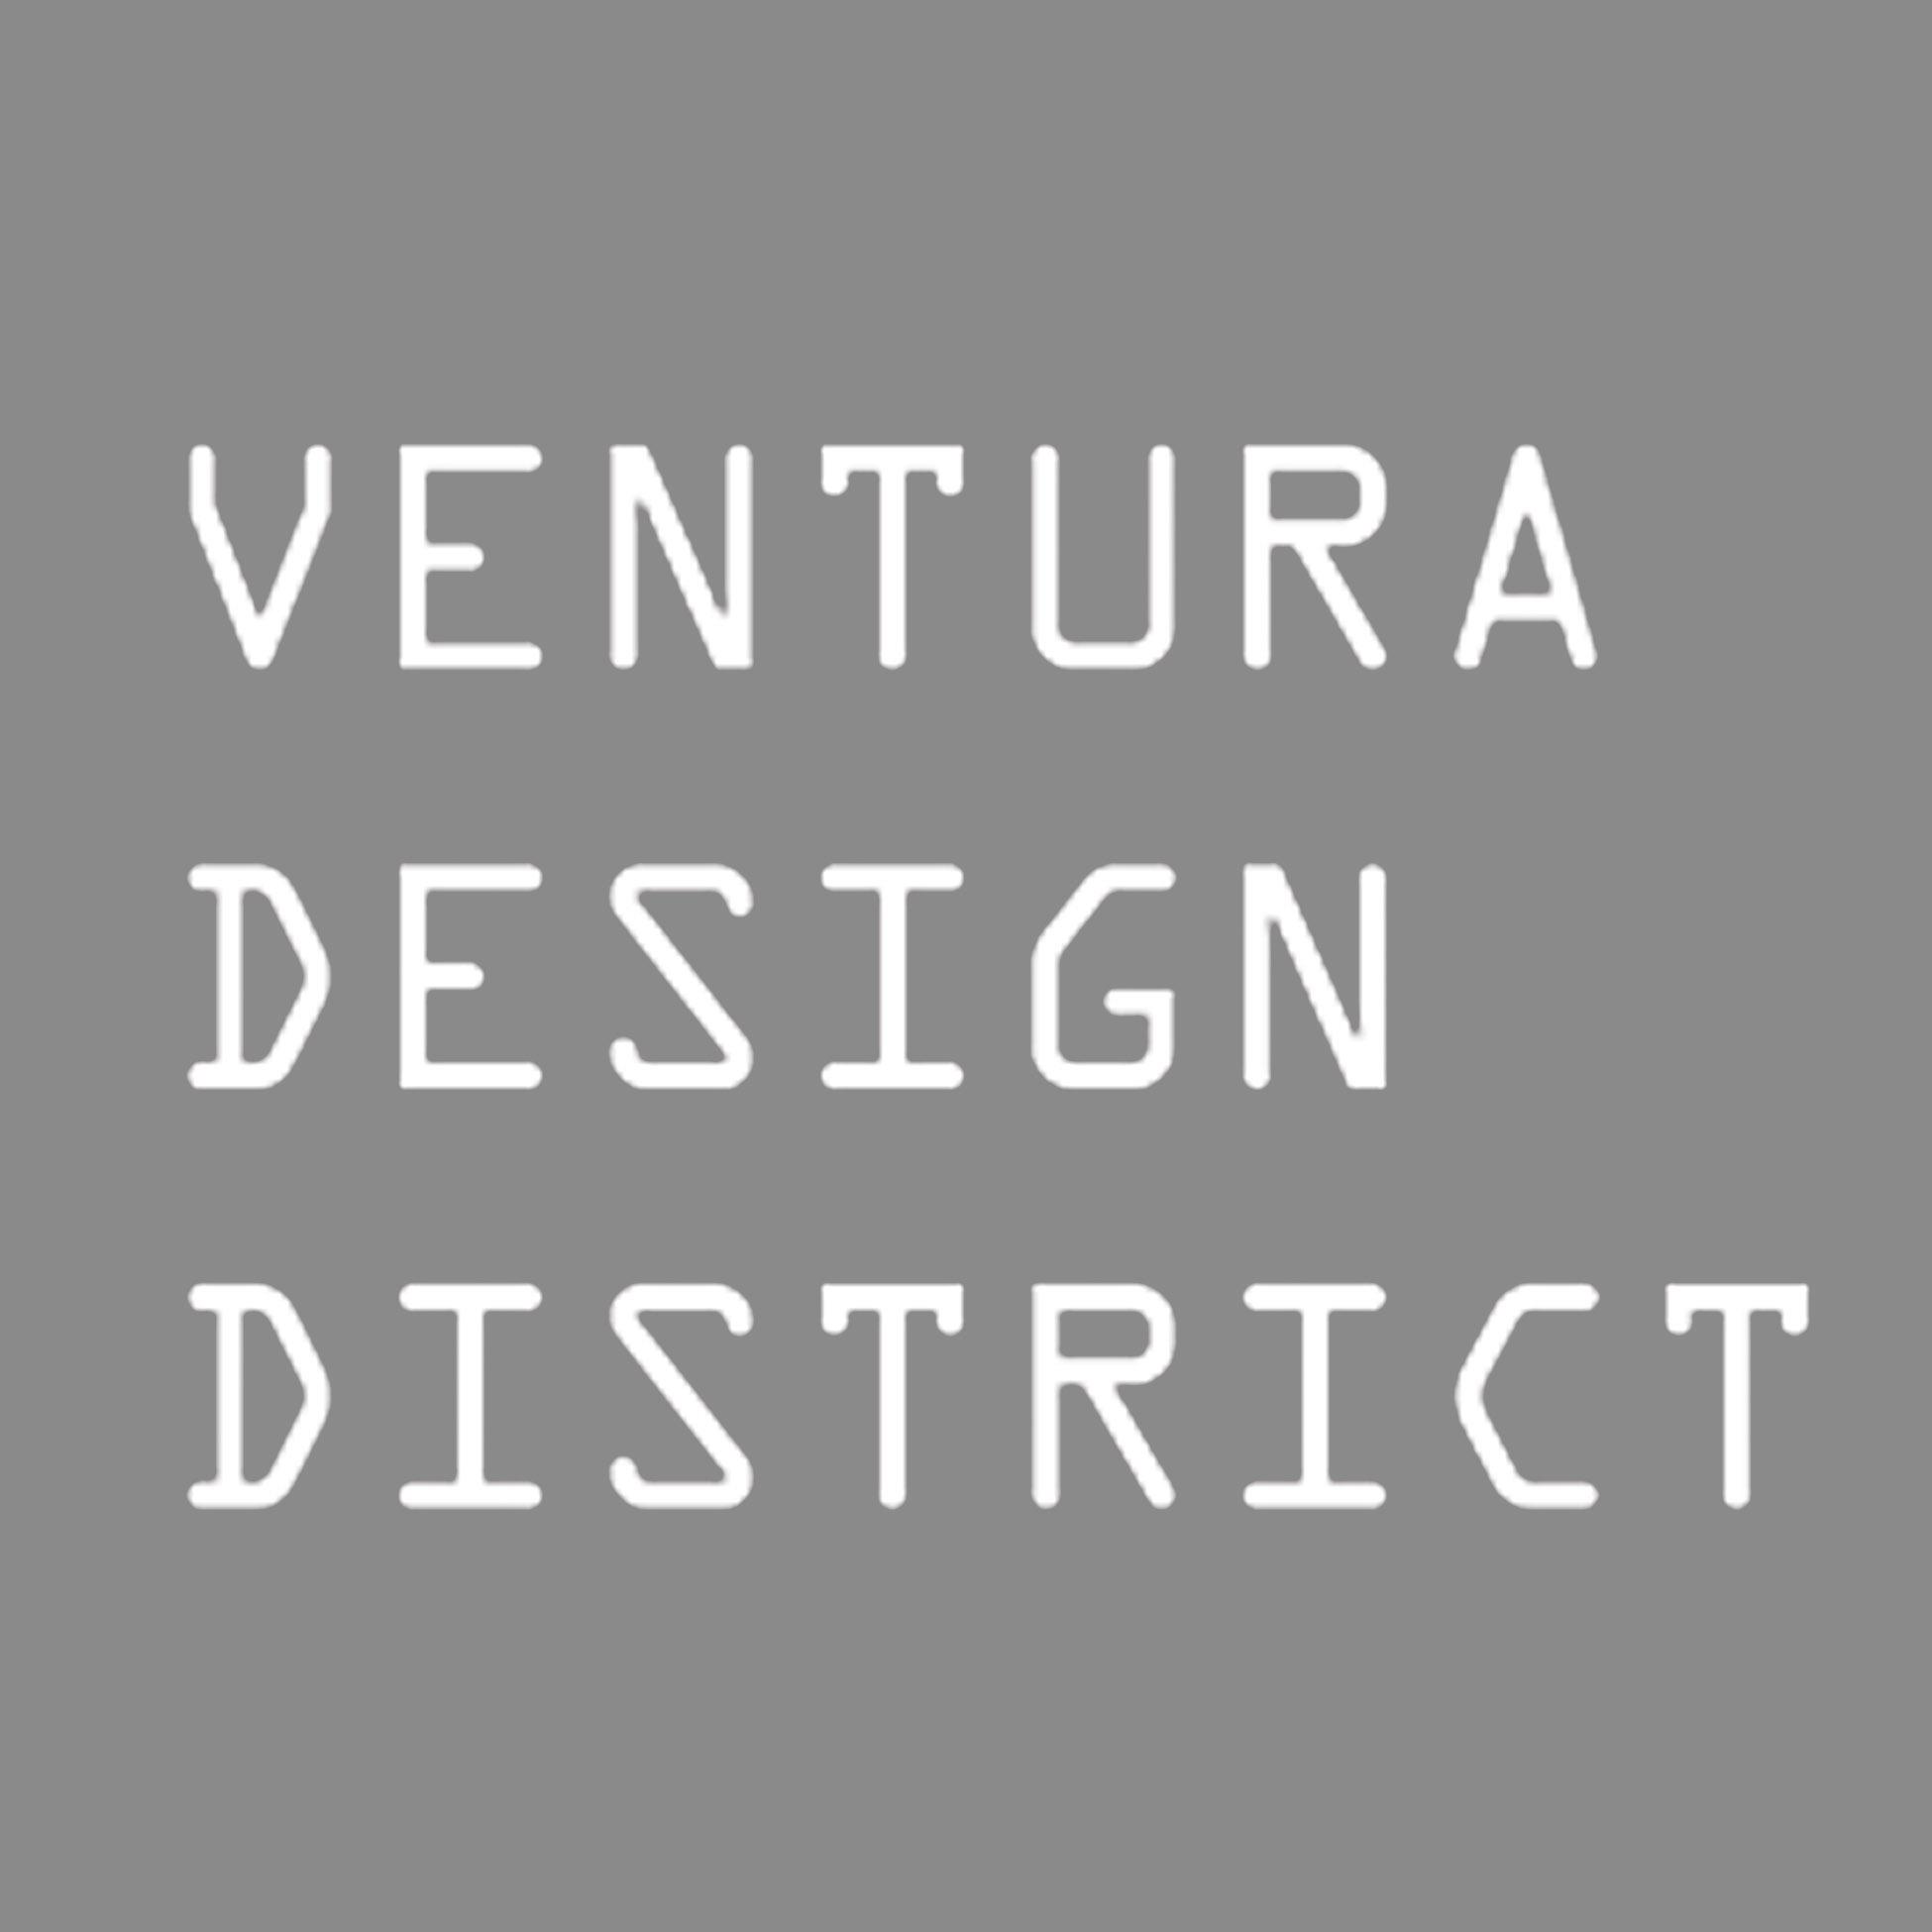 Ventura-Design-District.jpg